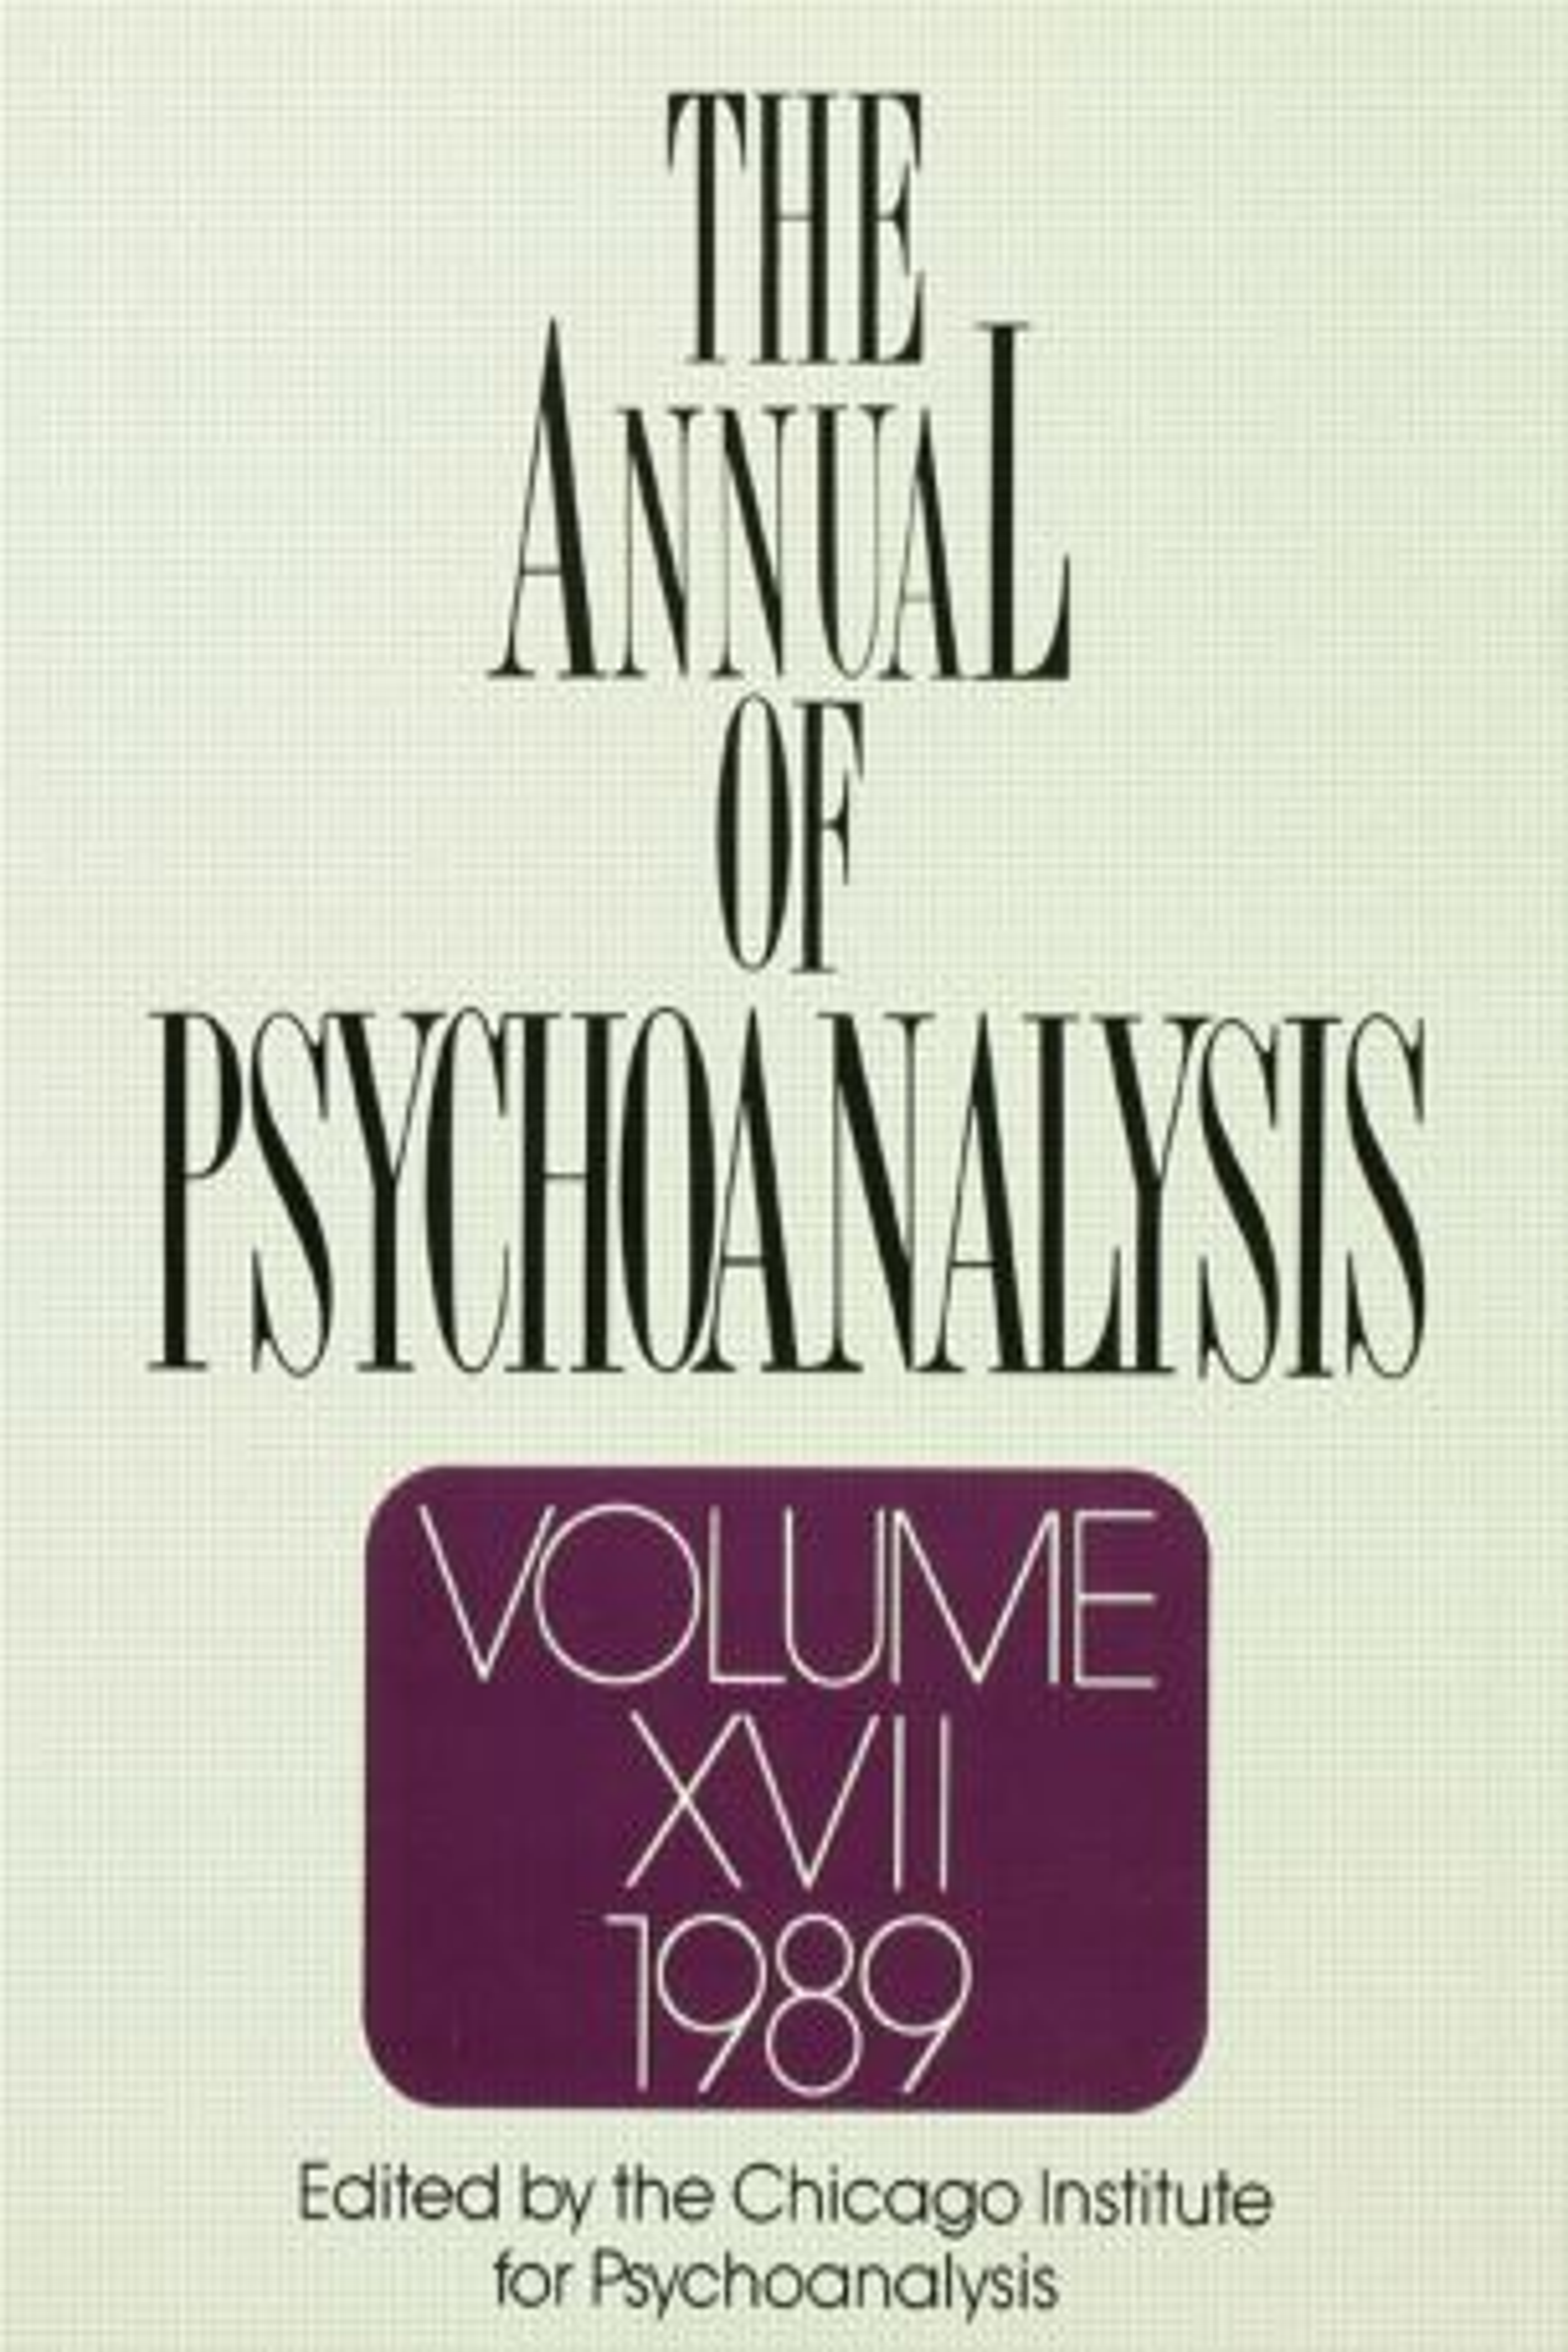 Psychoanalysis and Gender